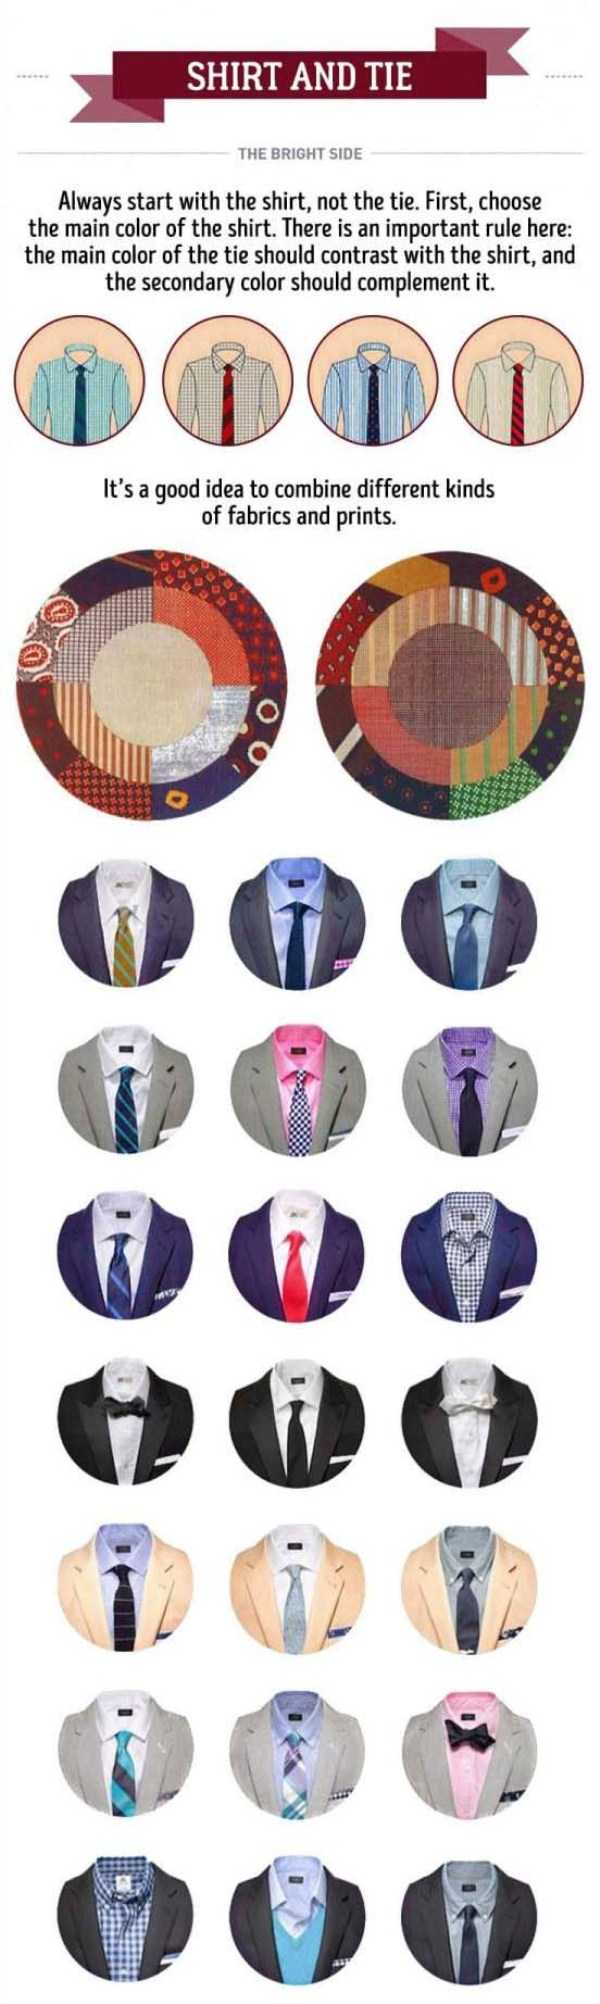 style-tips-modern-man (10)